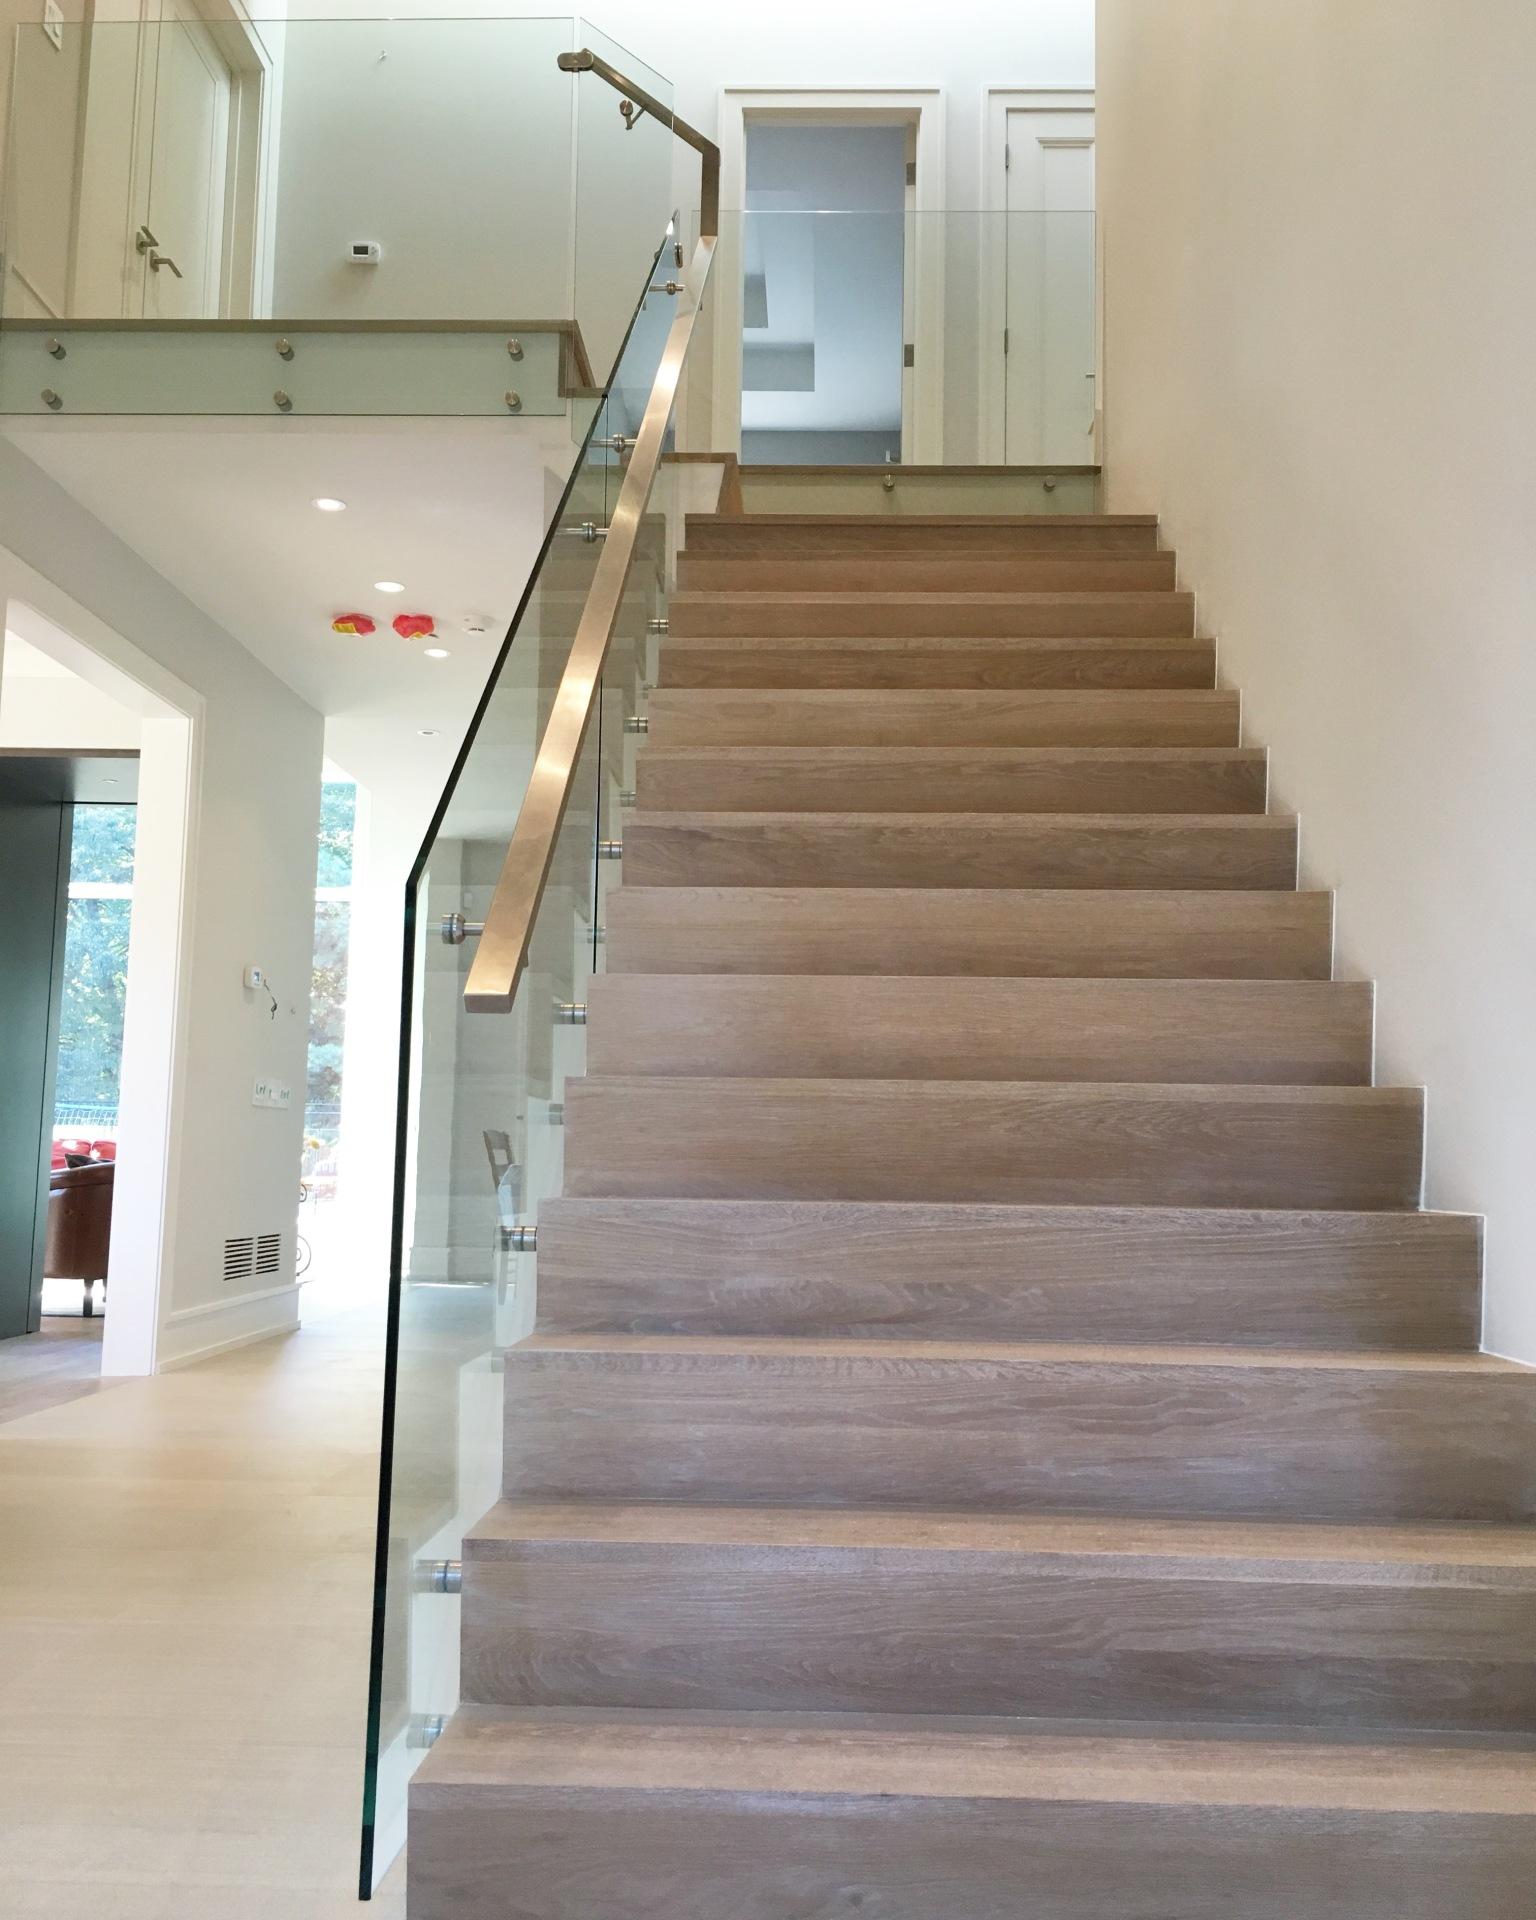 glass railing & handrail